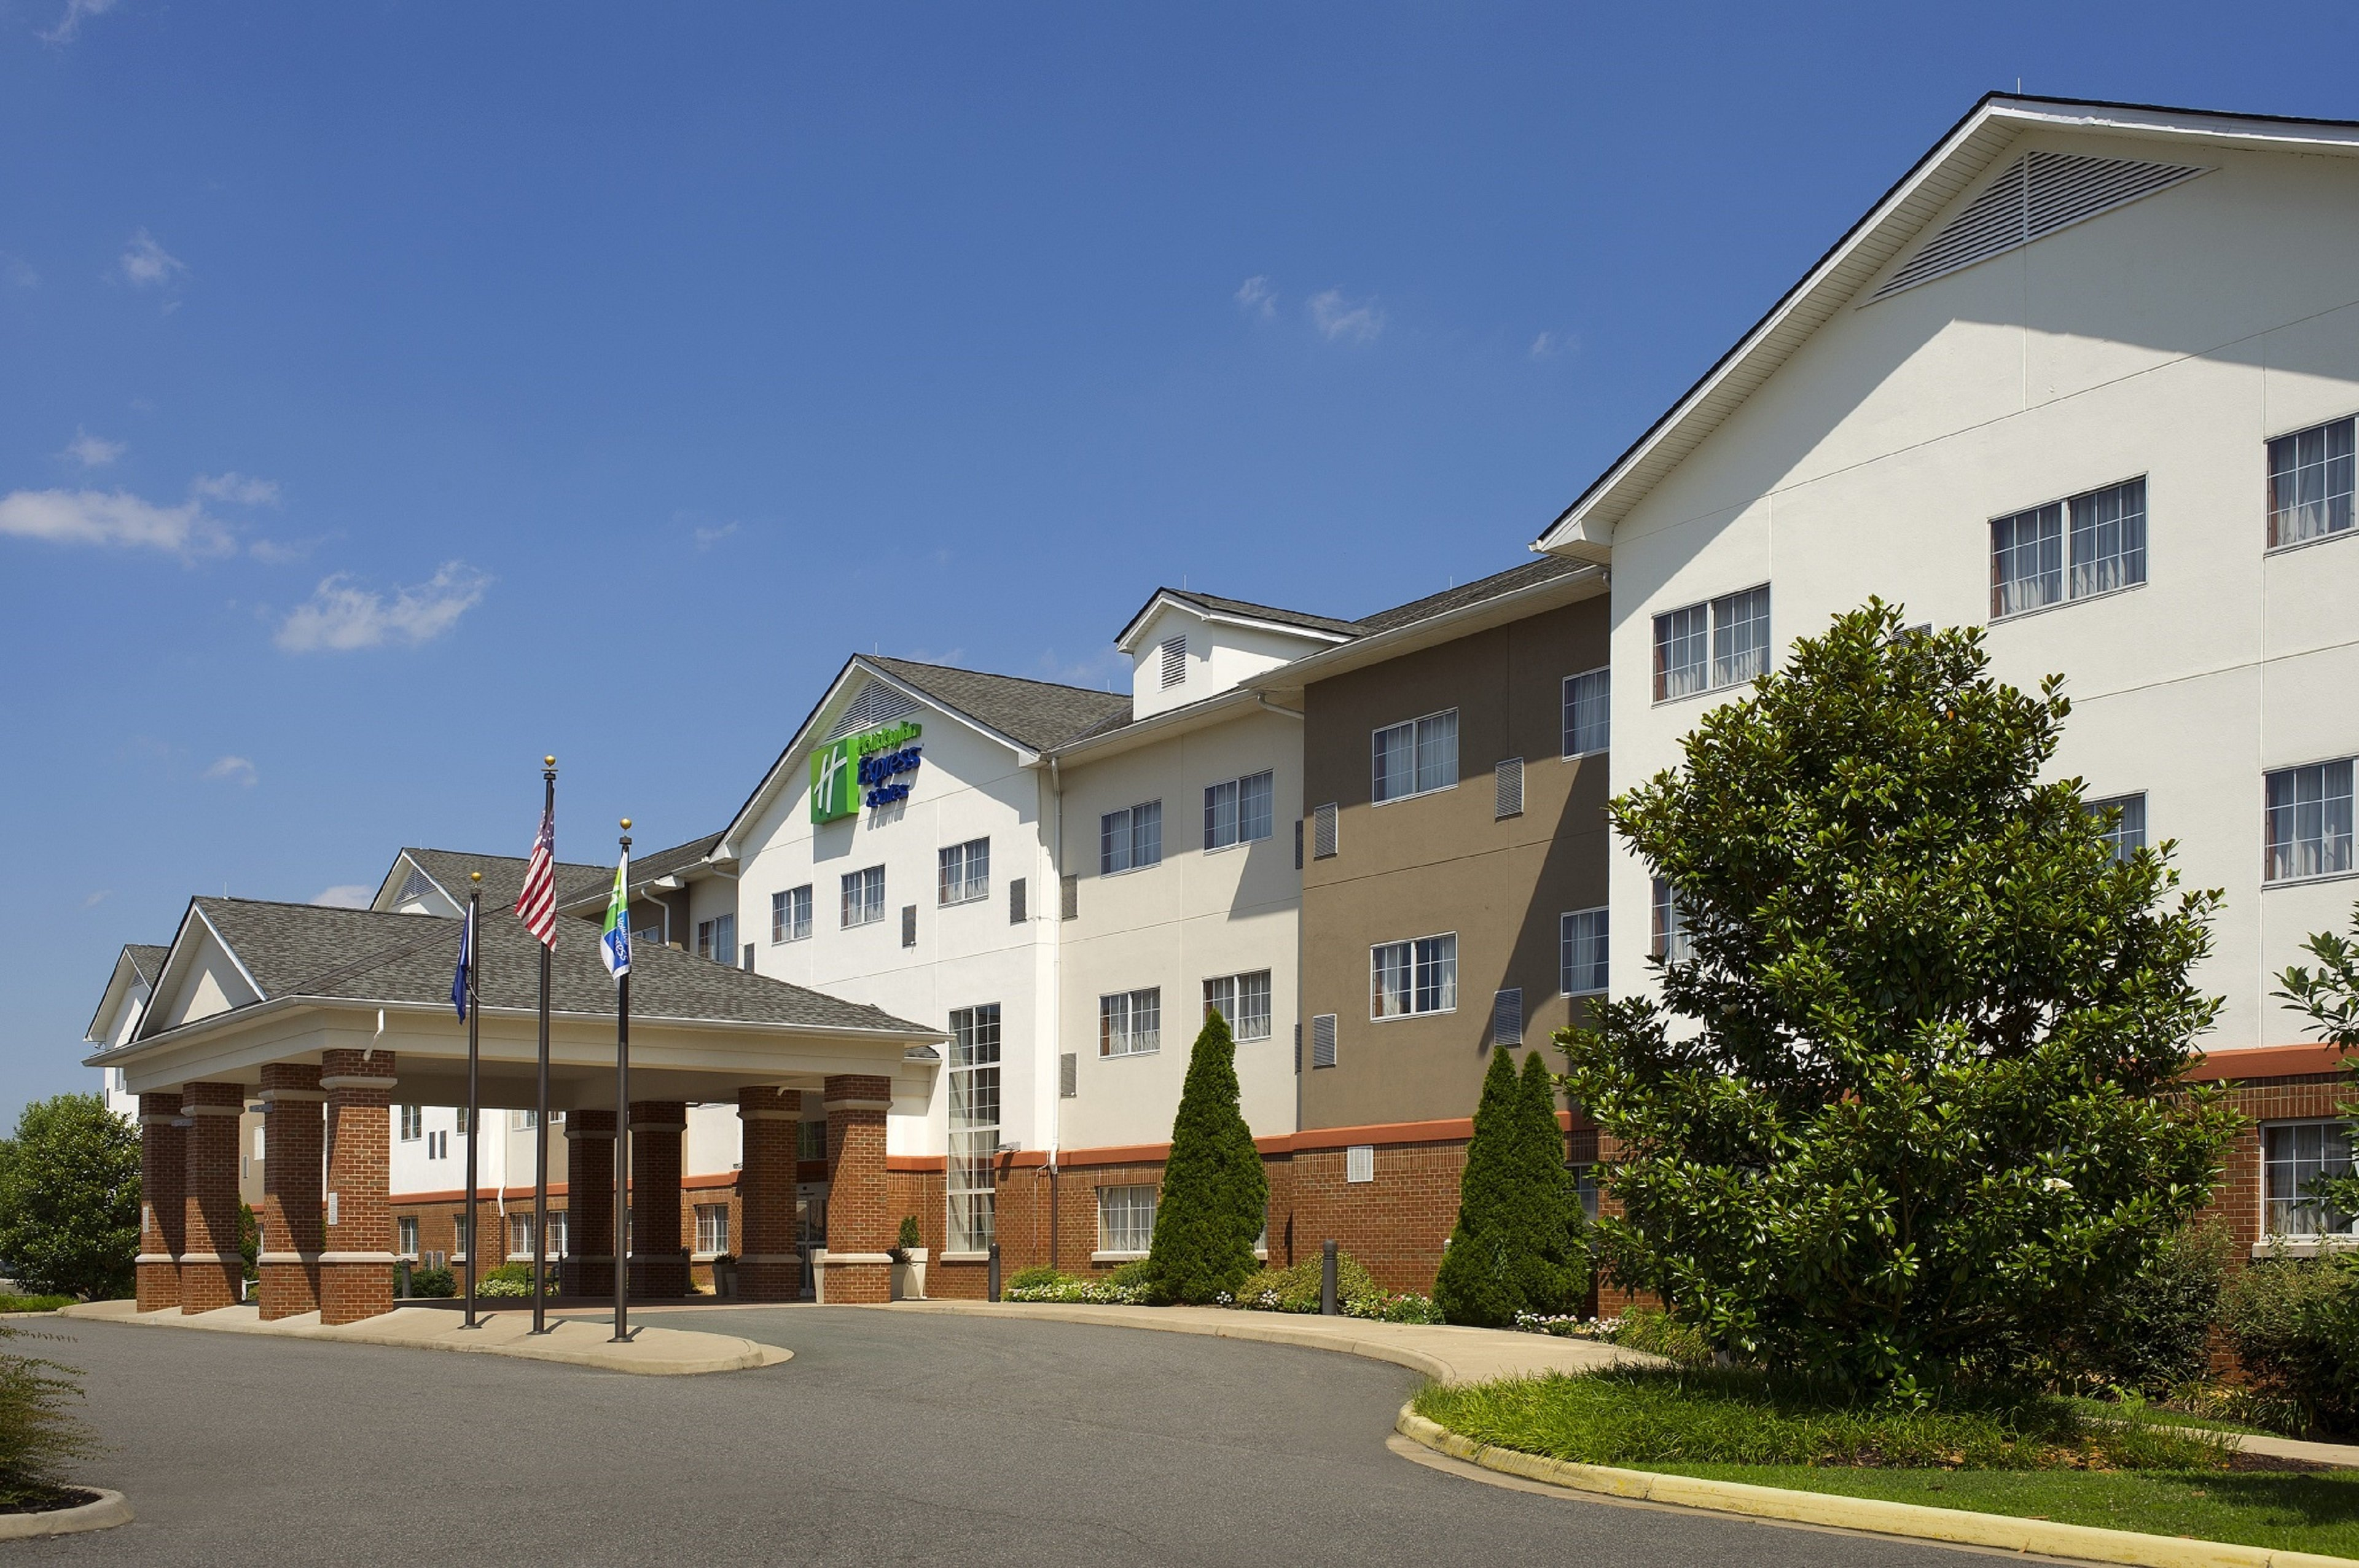 Holiday Inn Express/Stes Charlottesville